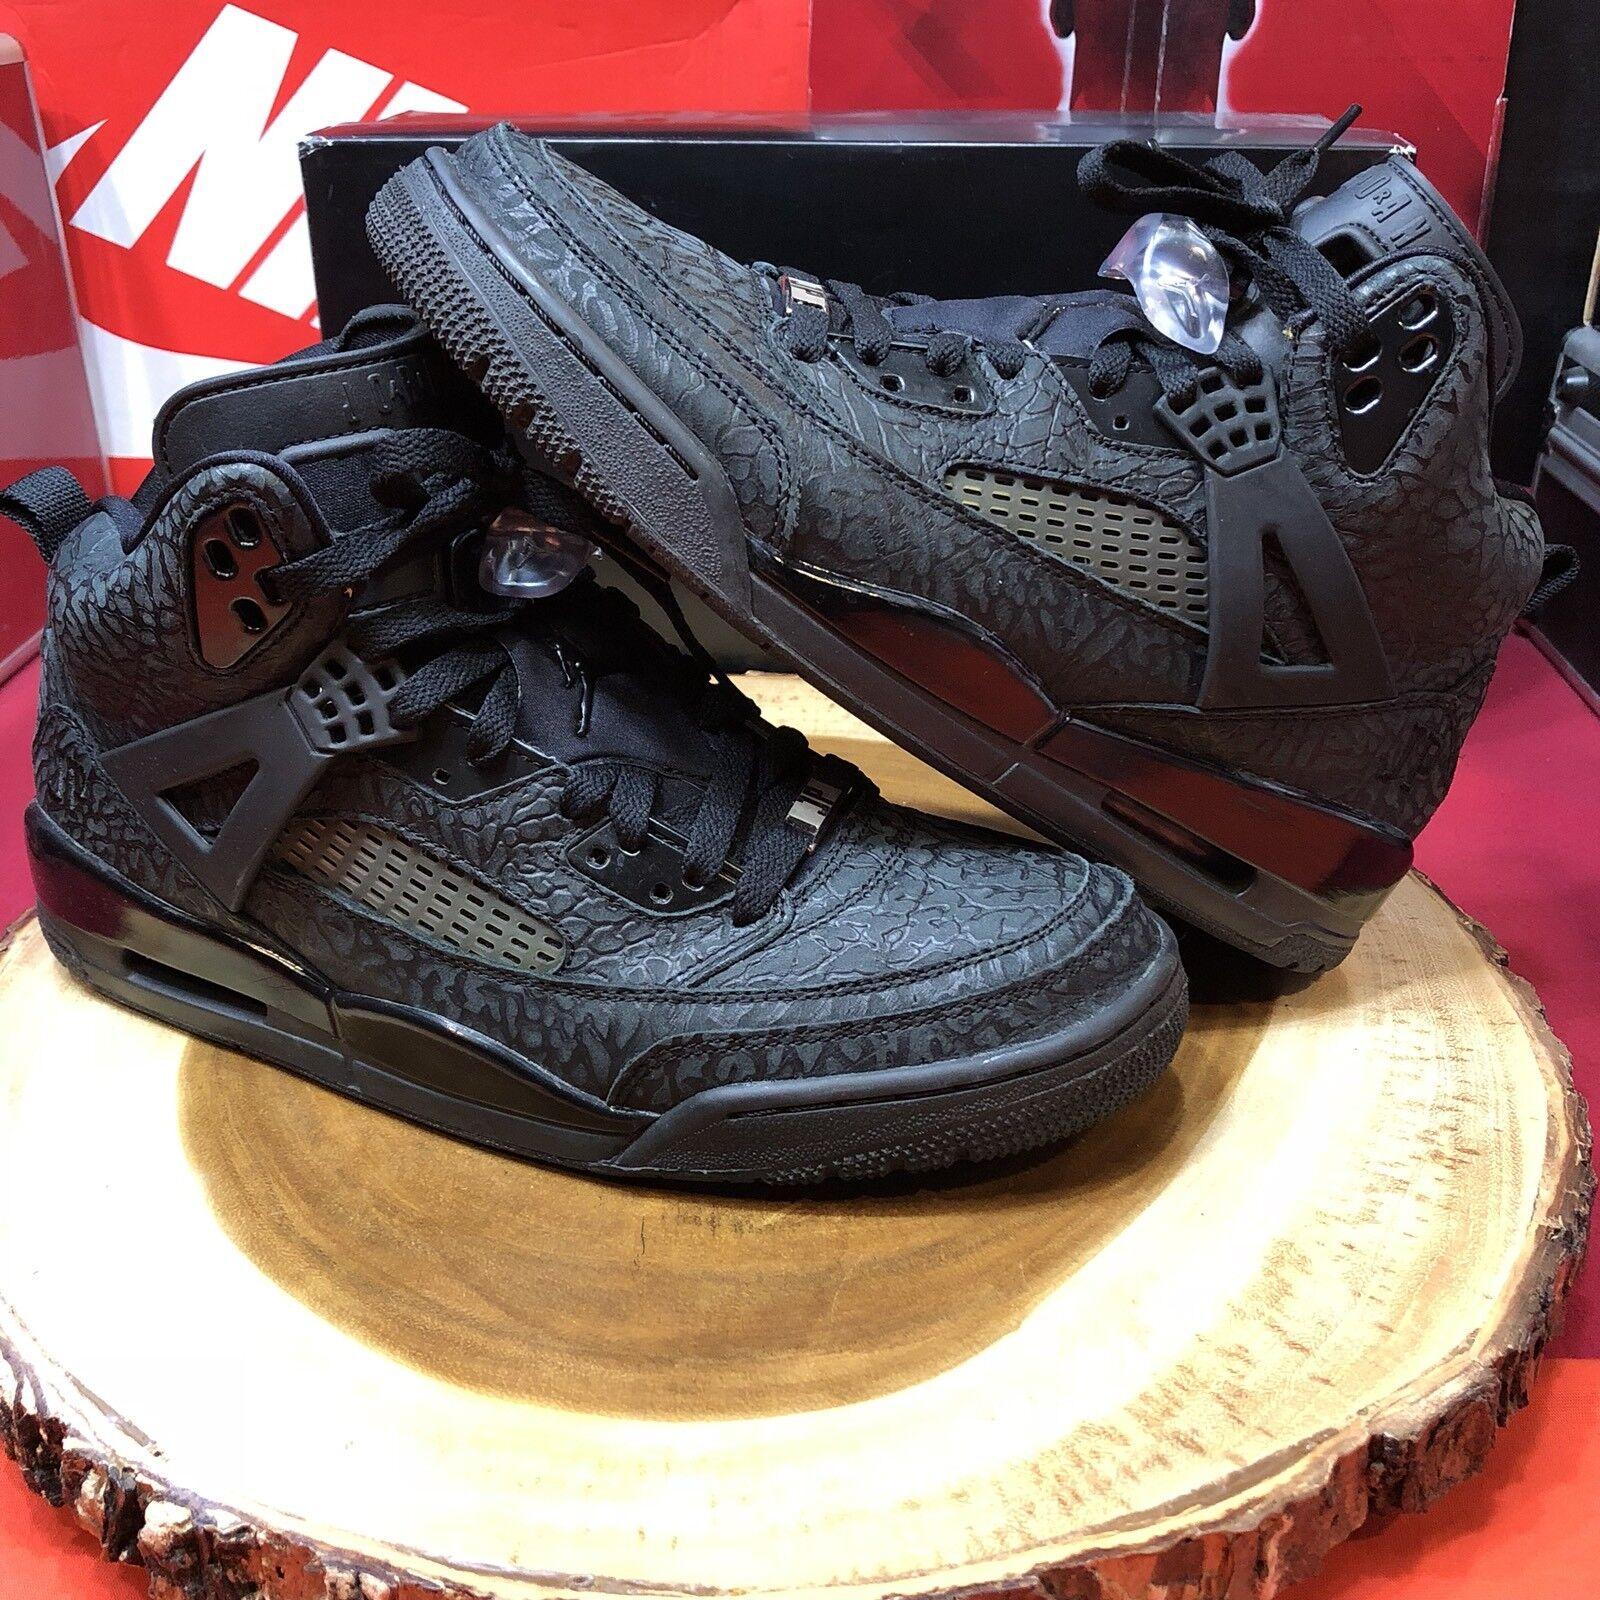 Nikeid nike air air air jordan spizike schwarze katze zement custom 605236 991 größe 10,5 iii 303890